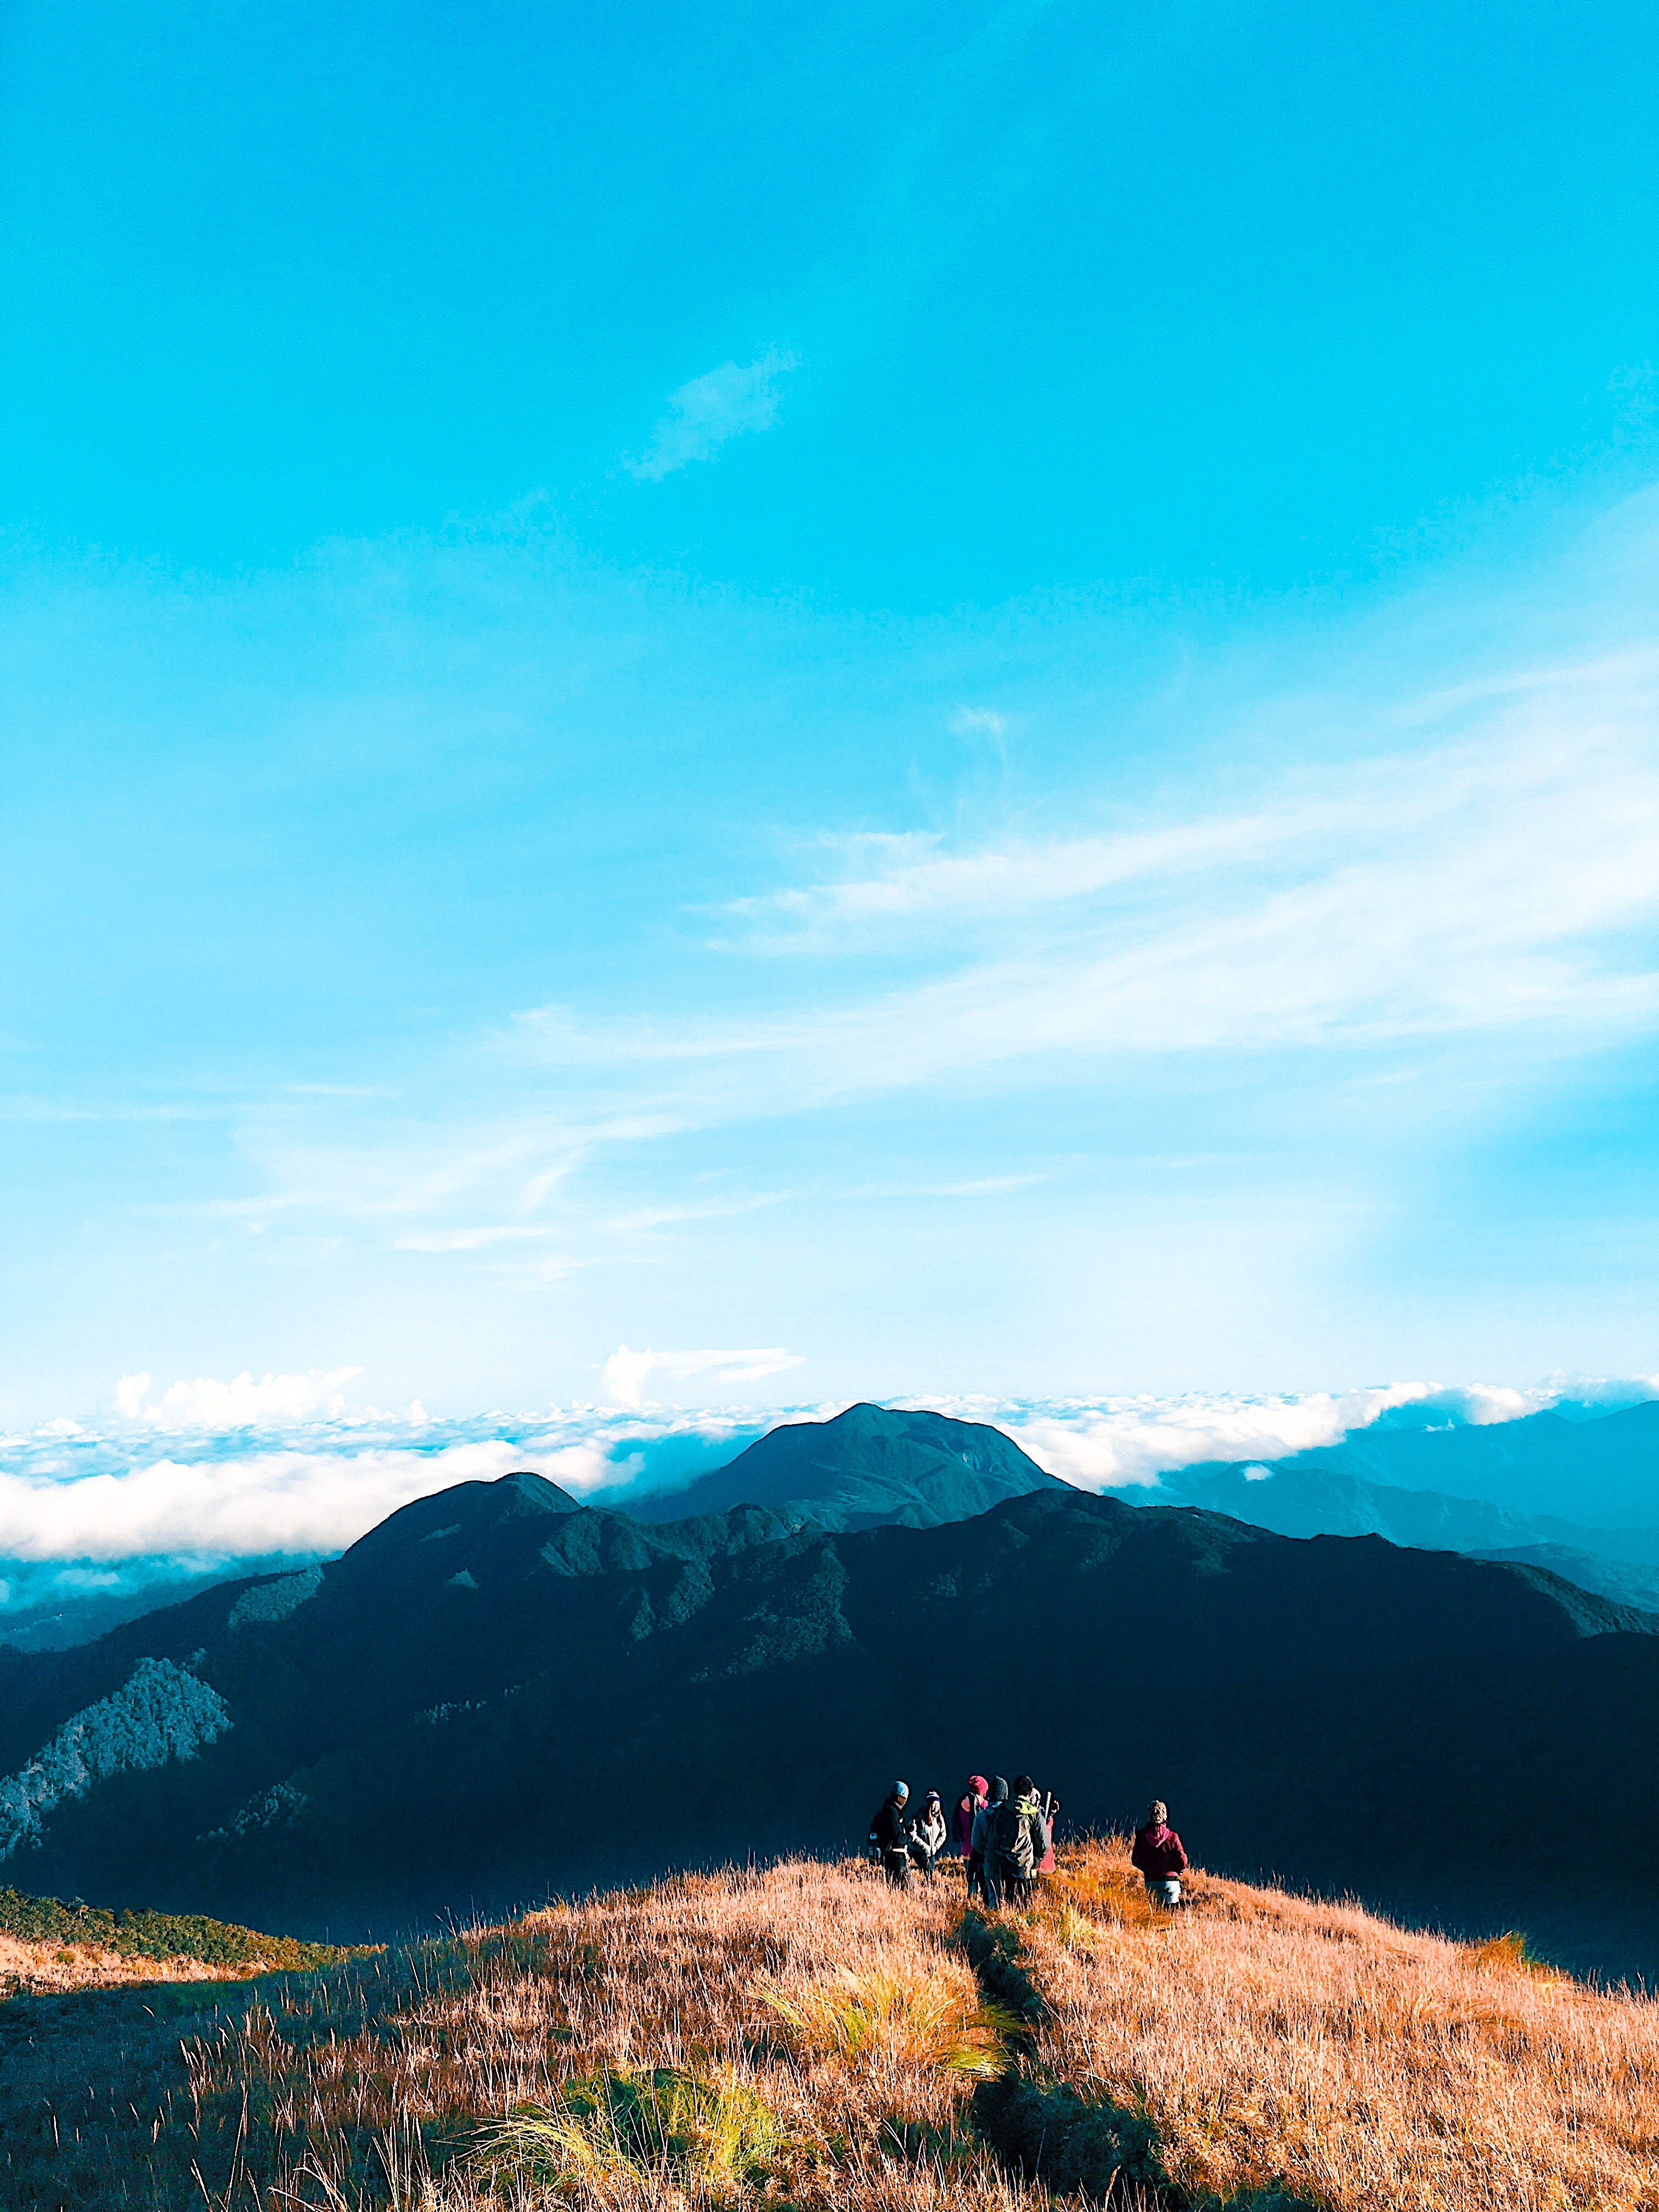 People walking on top of mountain photo